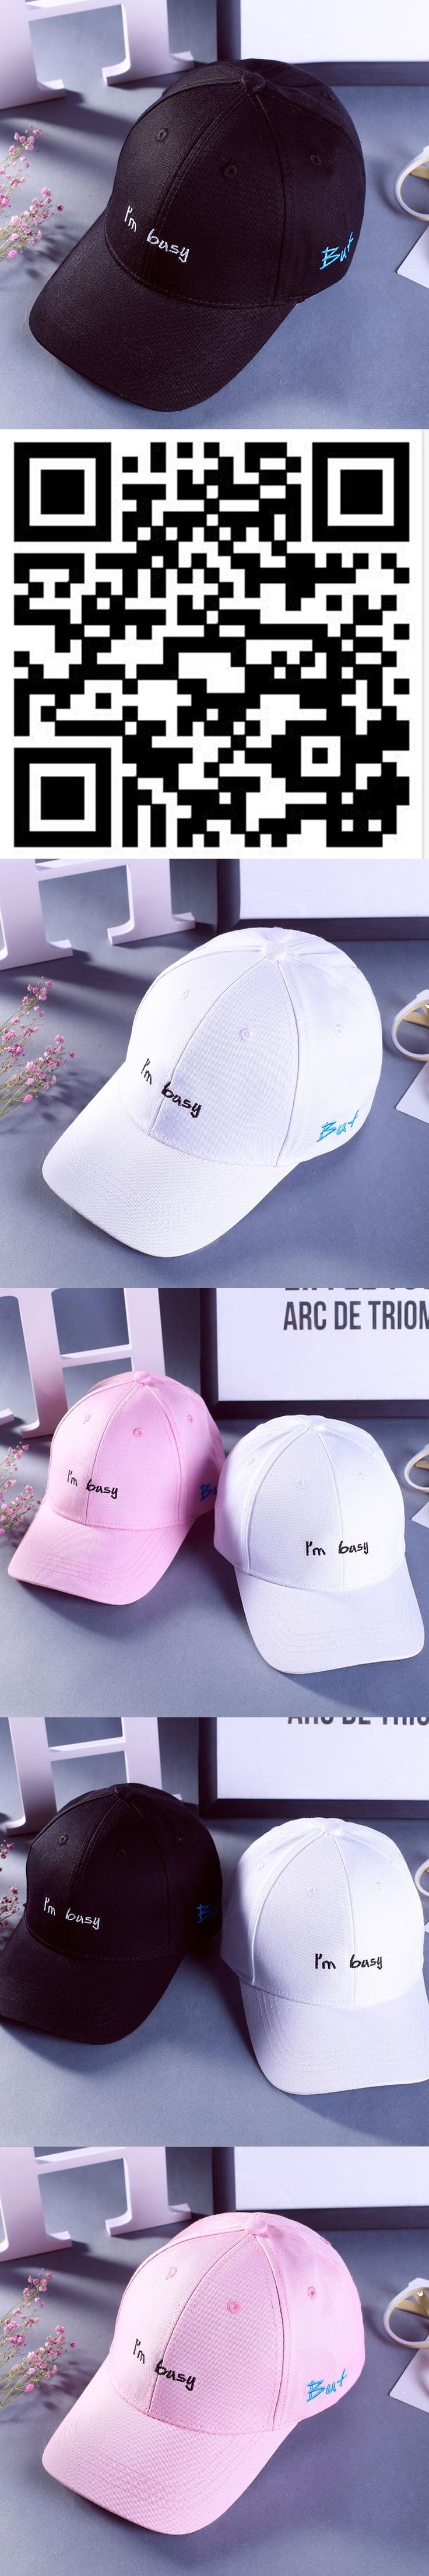 new fashion black baseball cap men women boutique embroidery cotton cap hats sun visor adult snapback women cap